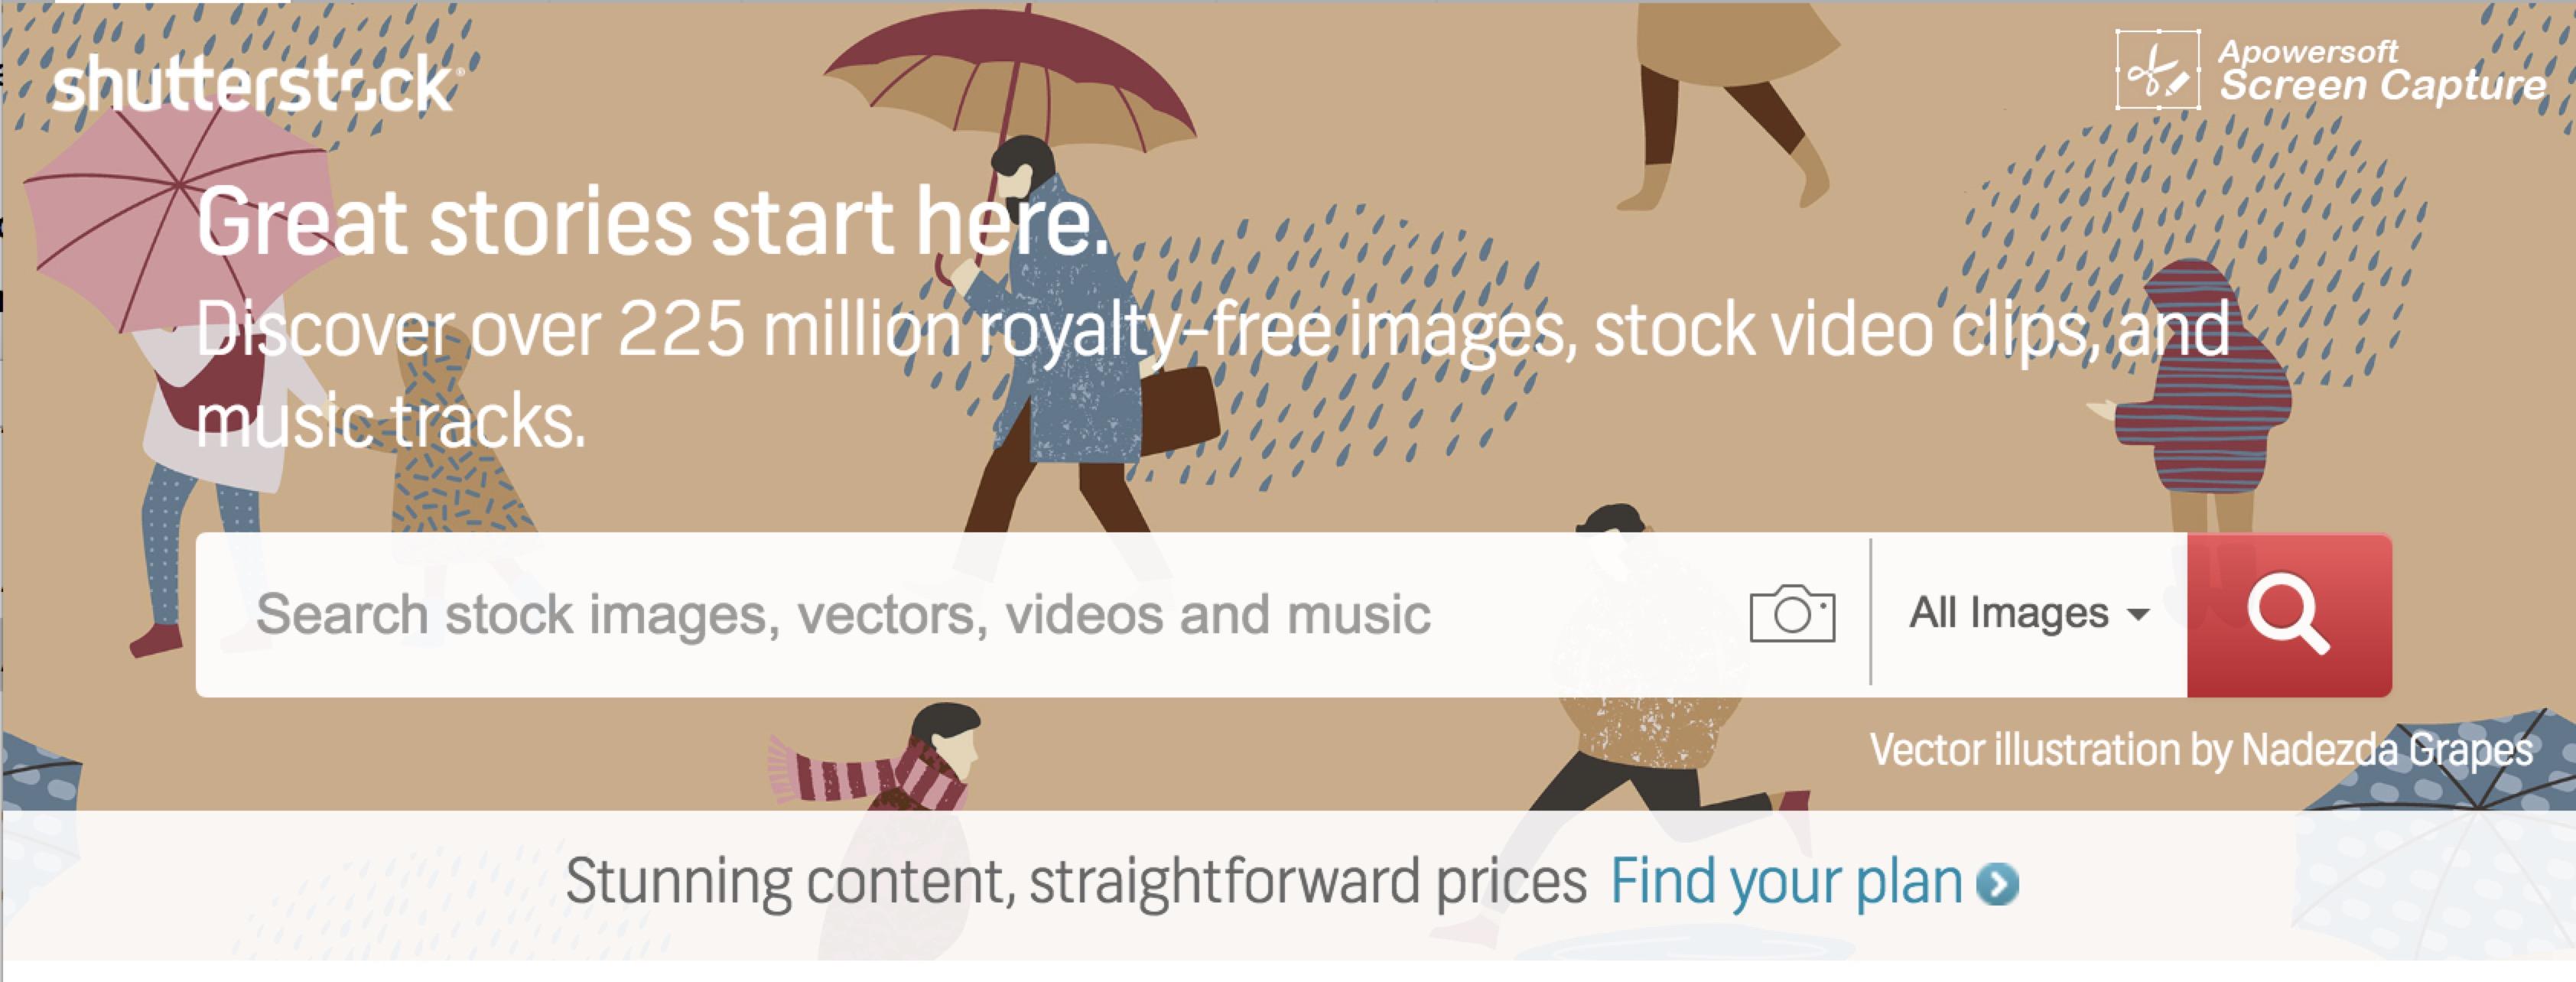 Shutterstock - Simply Nel Belle Blog